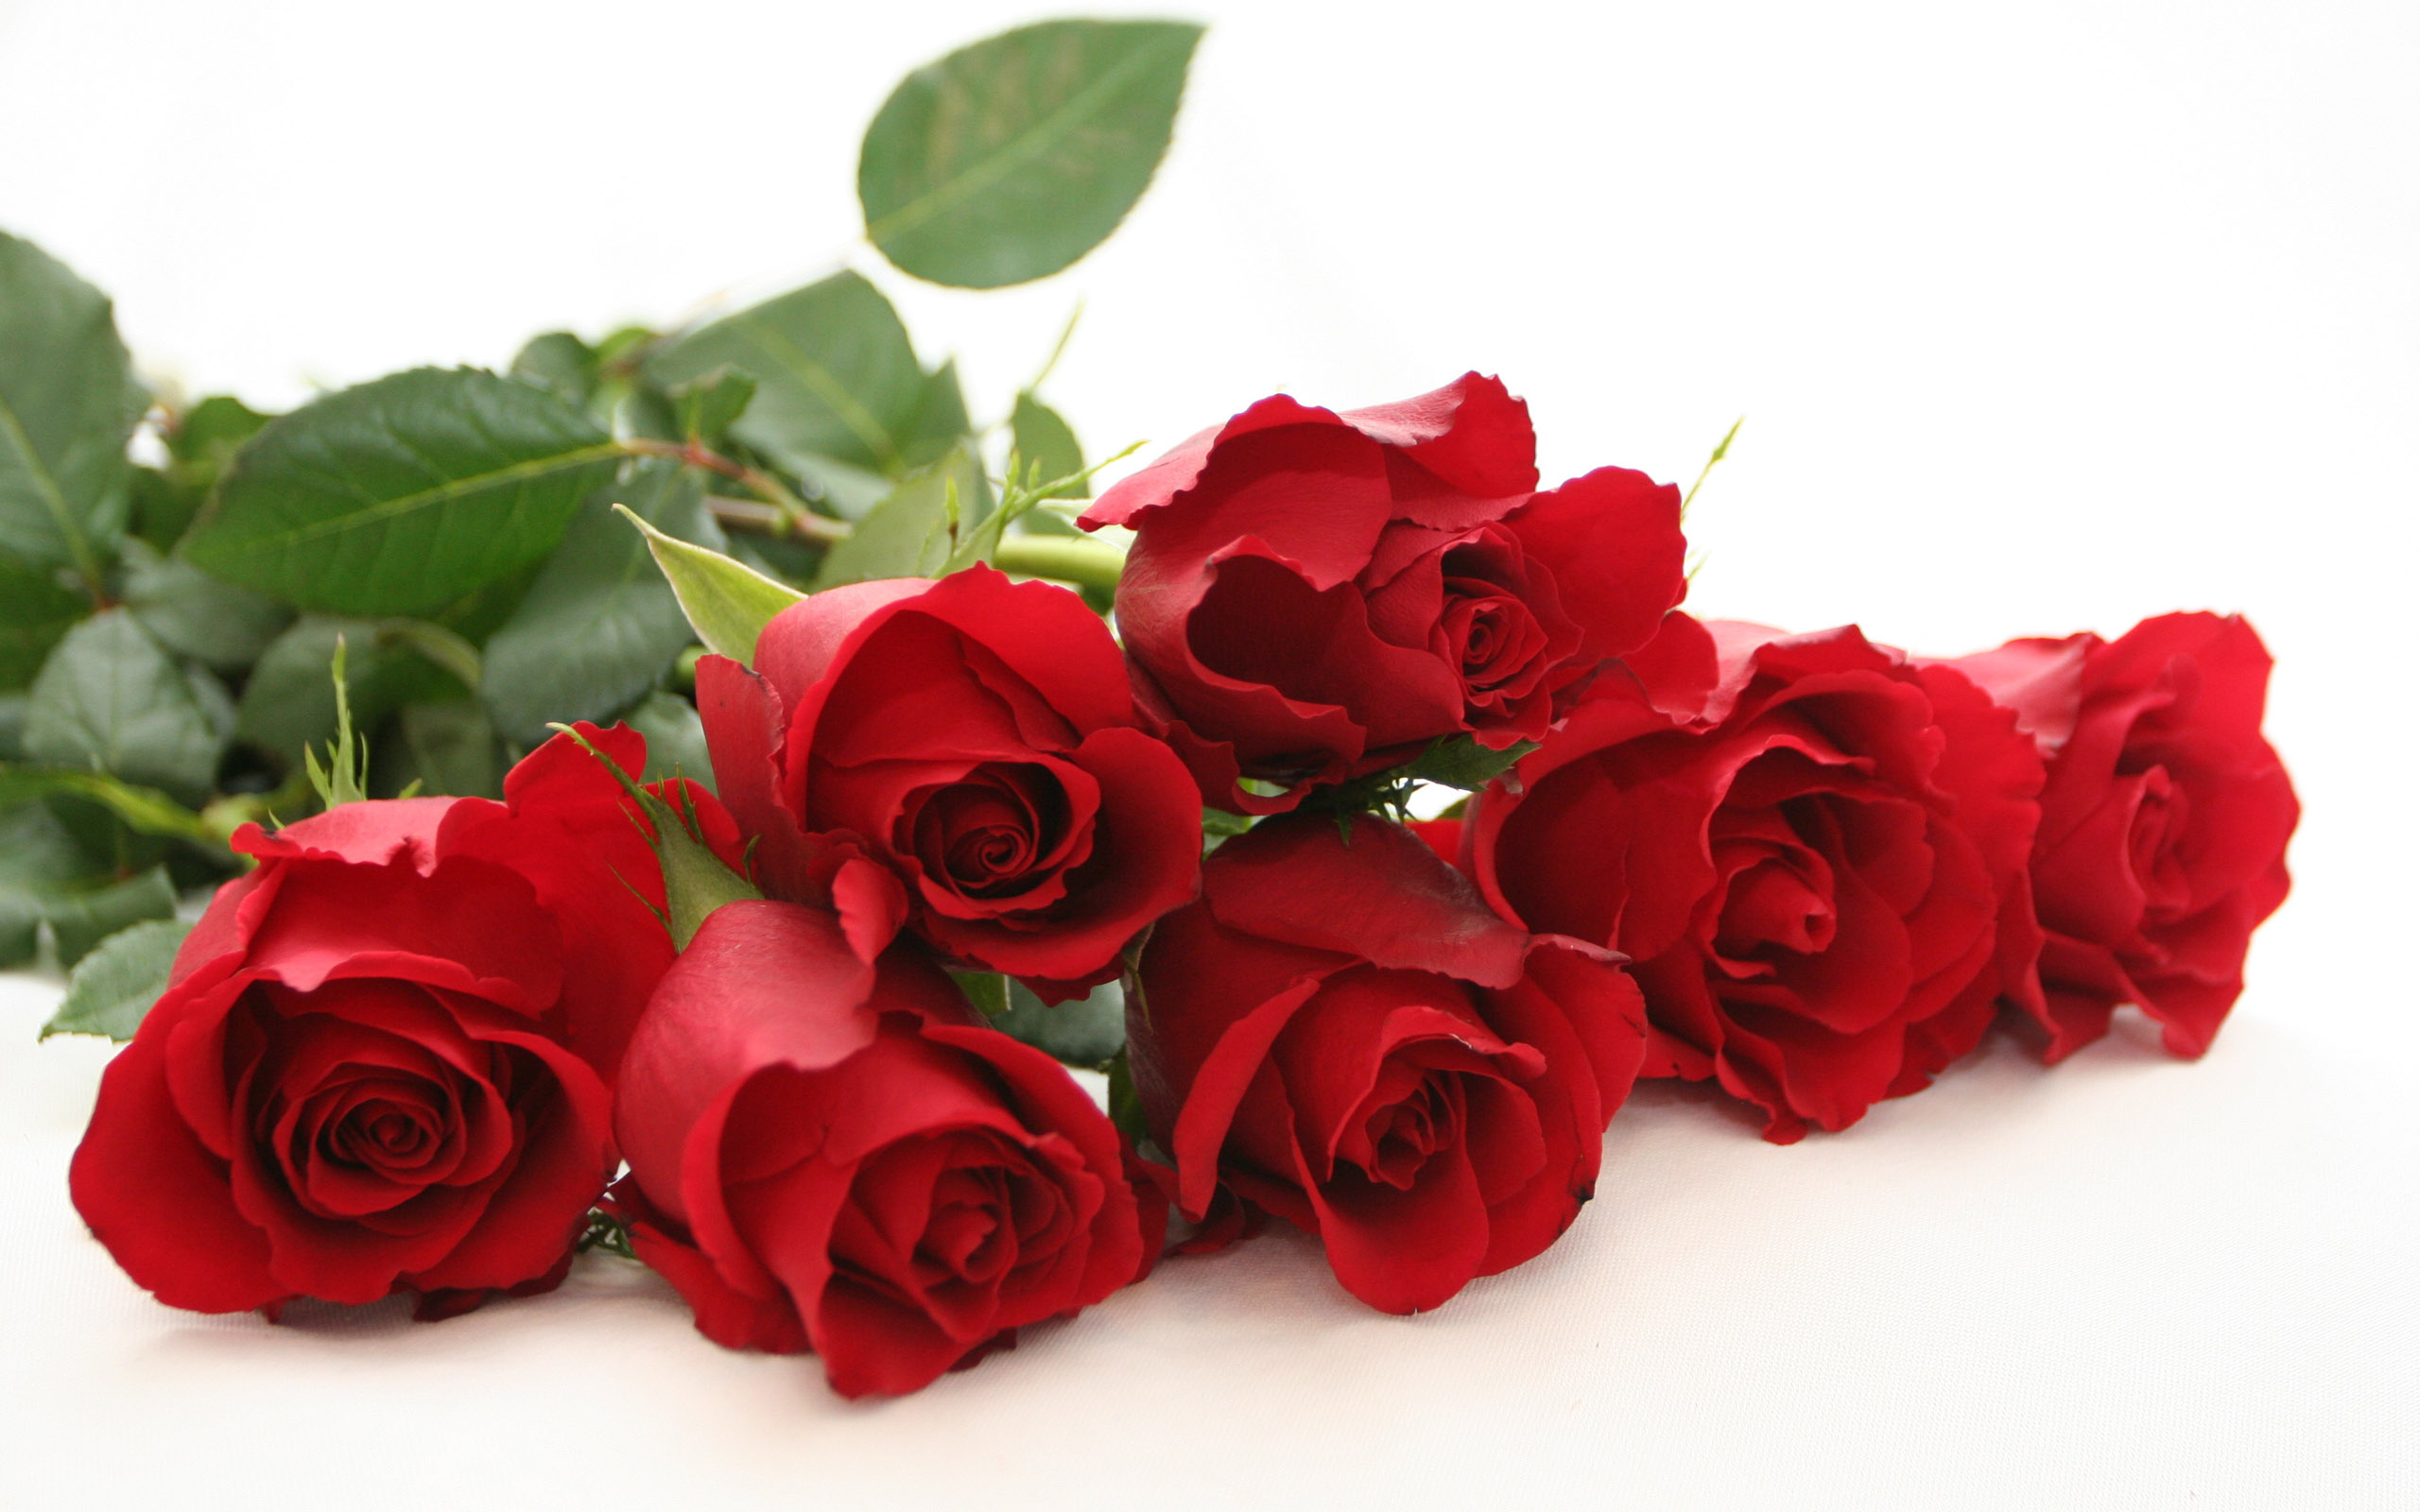 Rose Wallpaper Flowers 2560x1600 Download Hd Wallpaper Wallpapertip